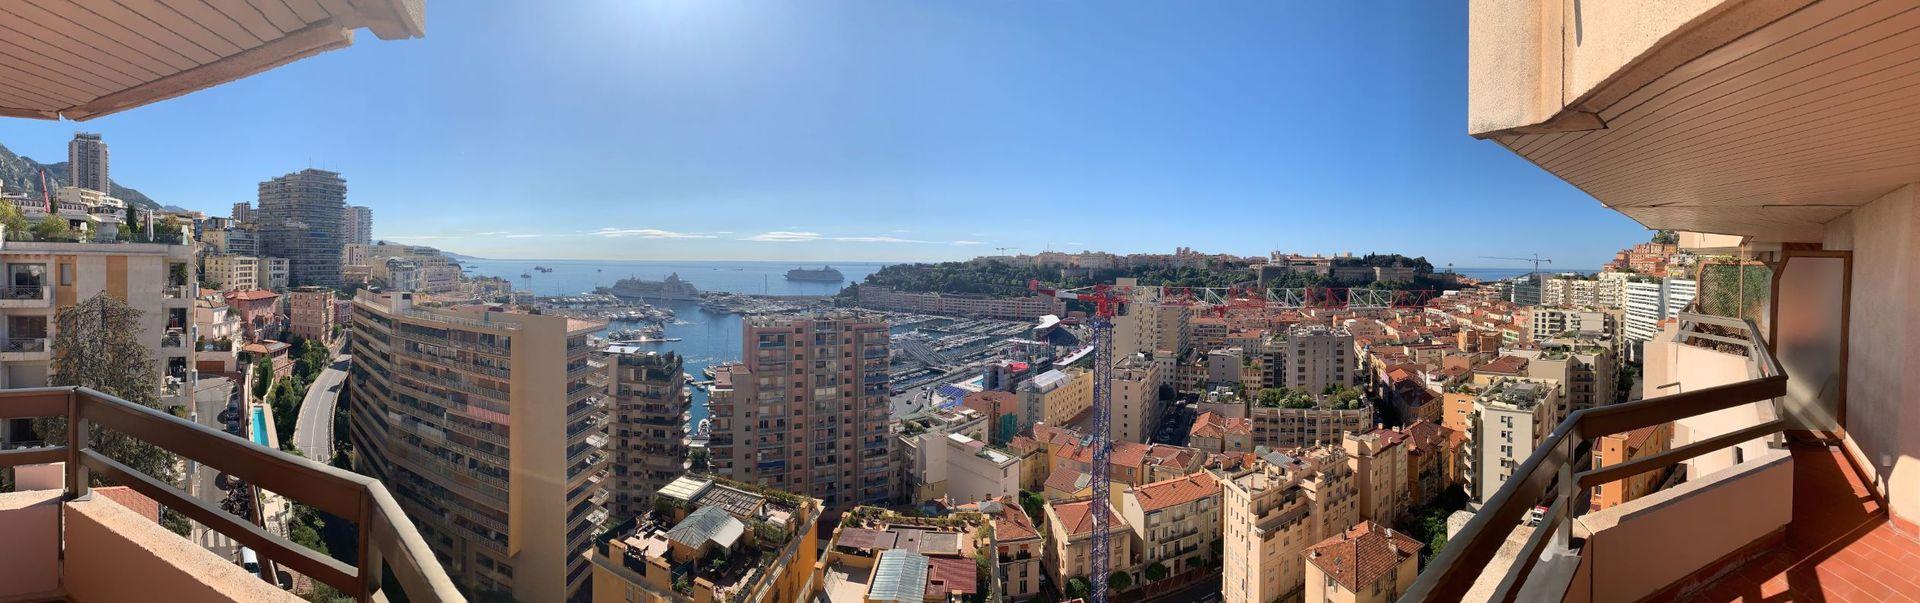 Apartment-for-Sale-Monaco-Port-View